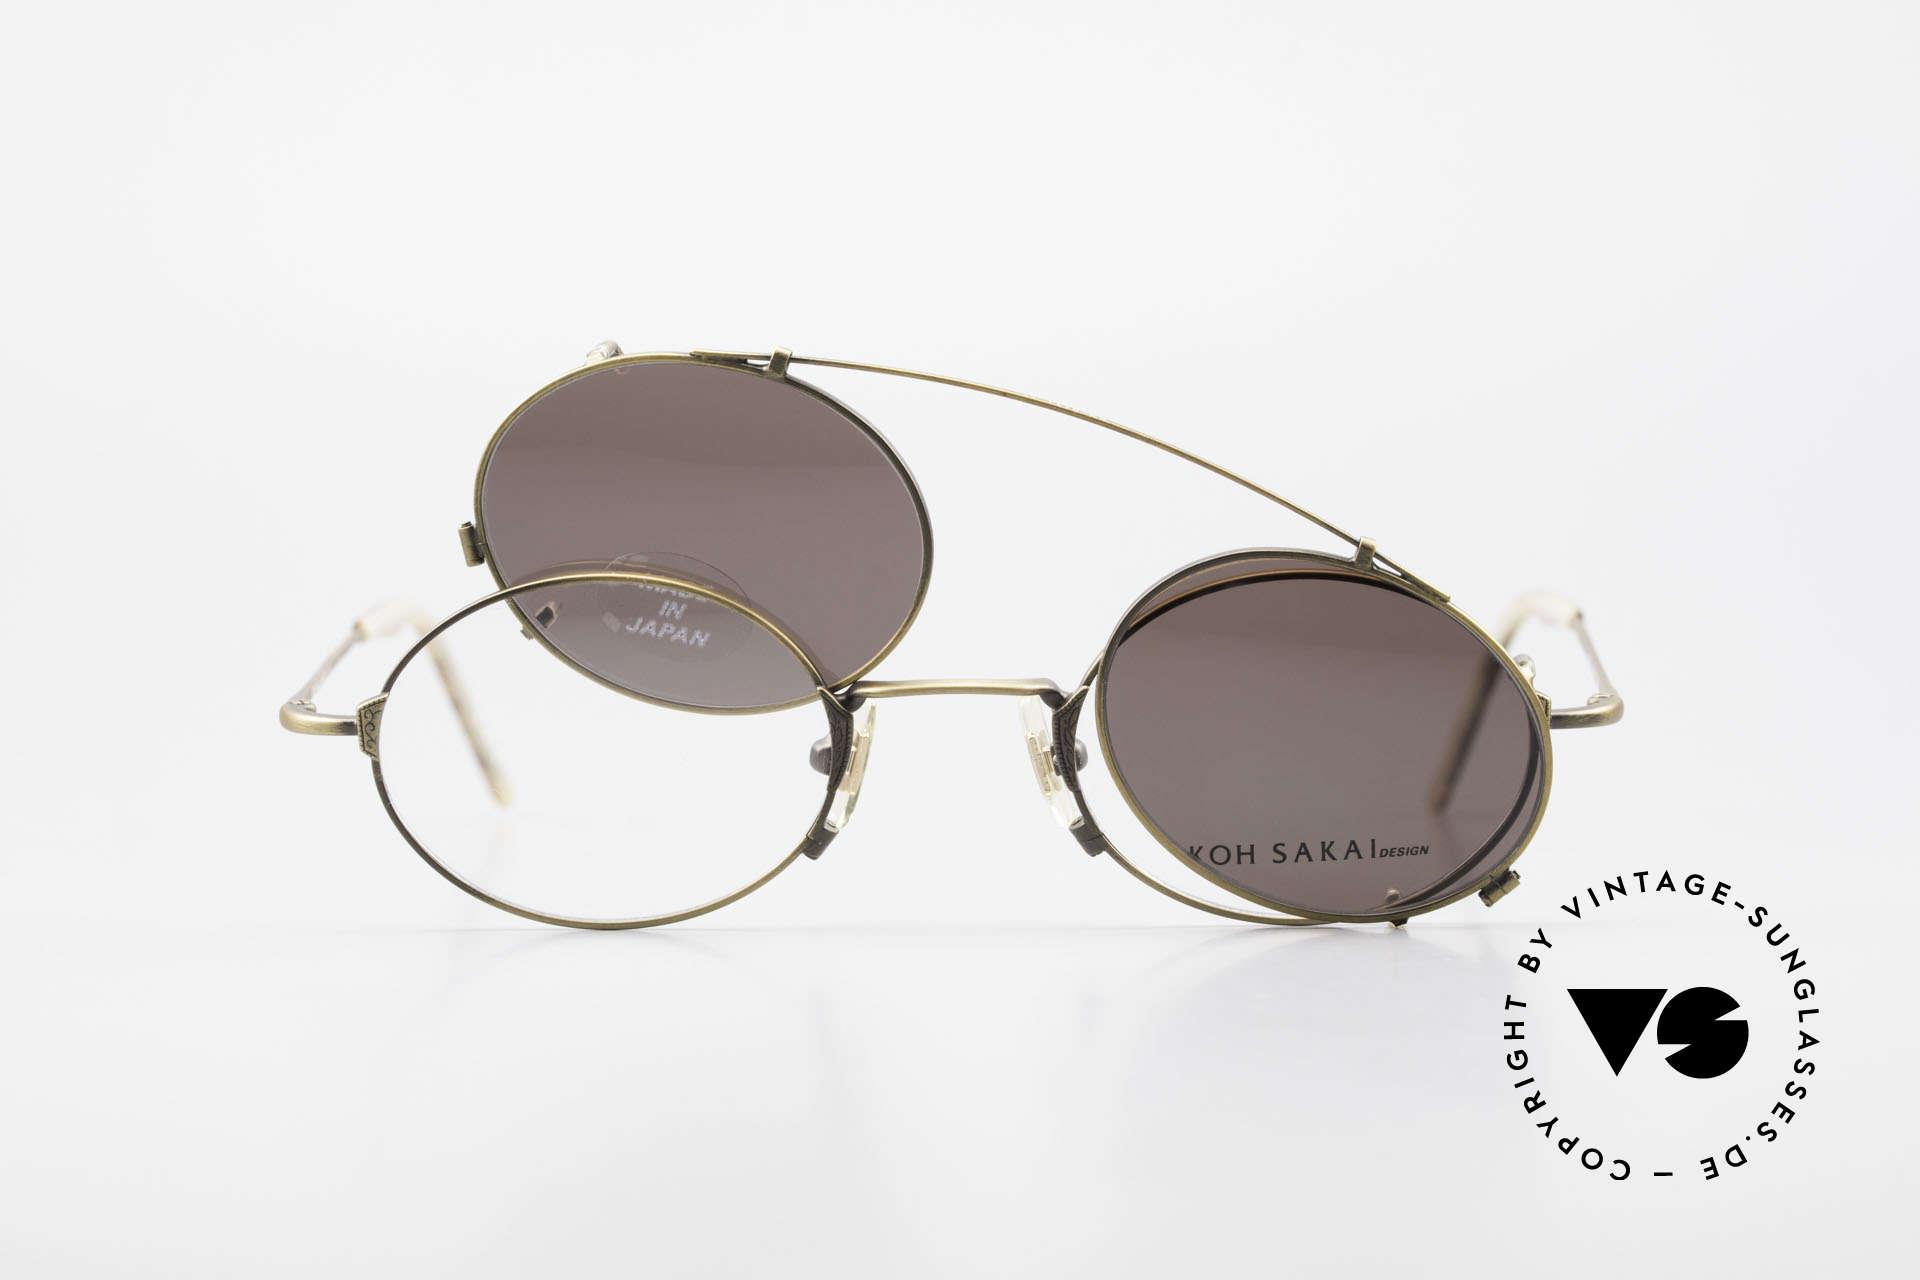 Koh Sakai KS9711 Vintage Glasses Oval Clip On, Size: small, Made for Men and Women